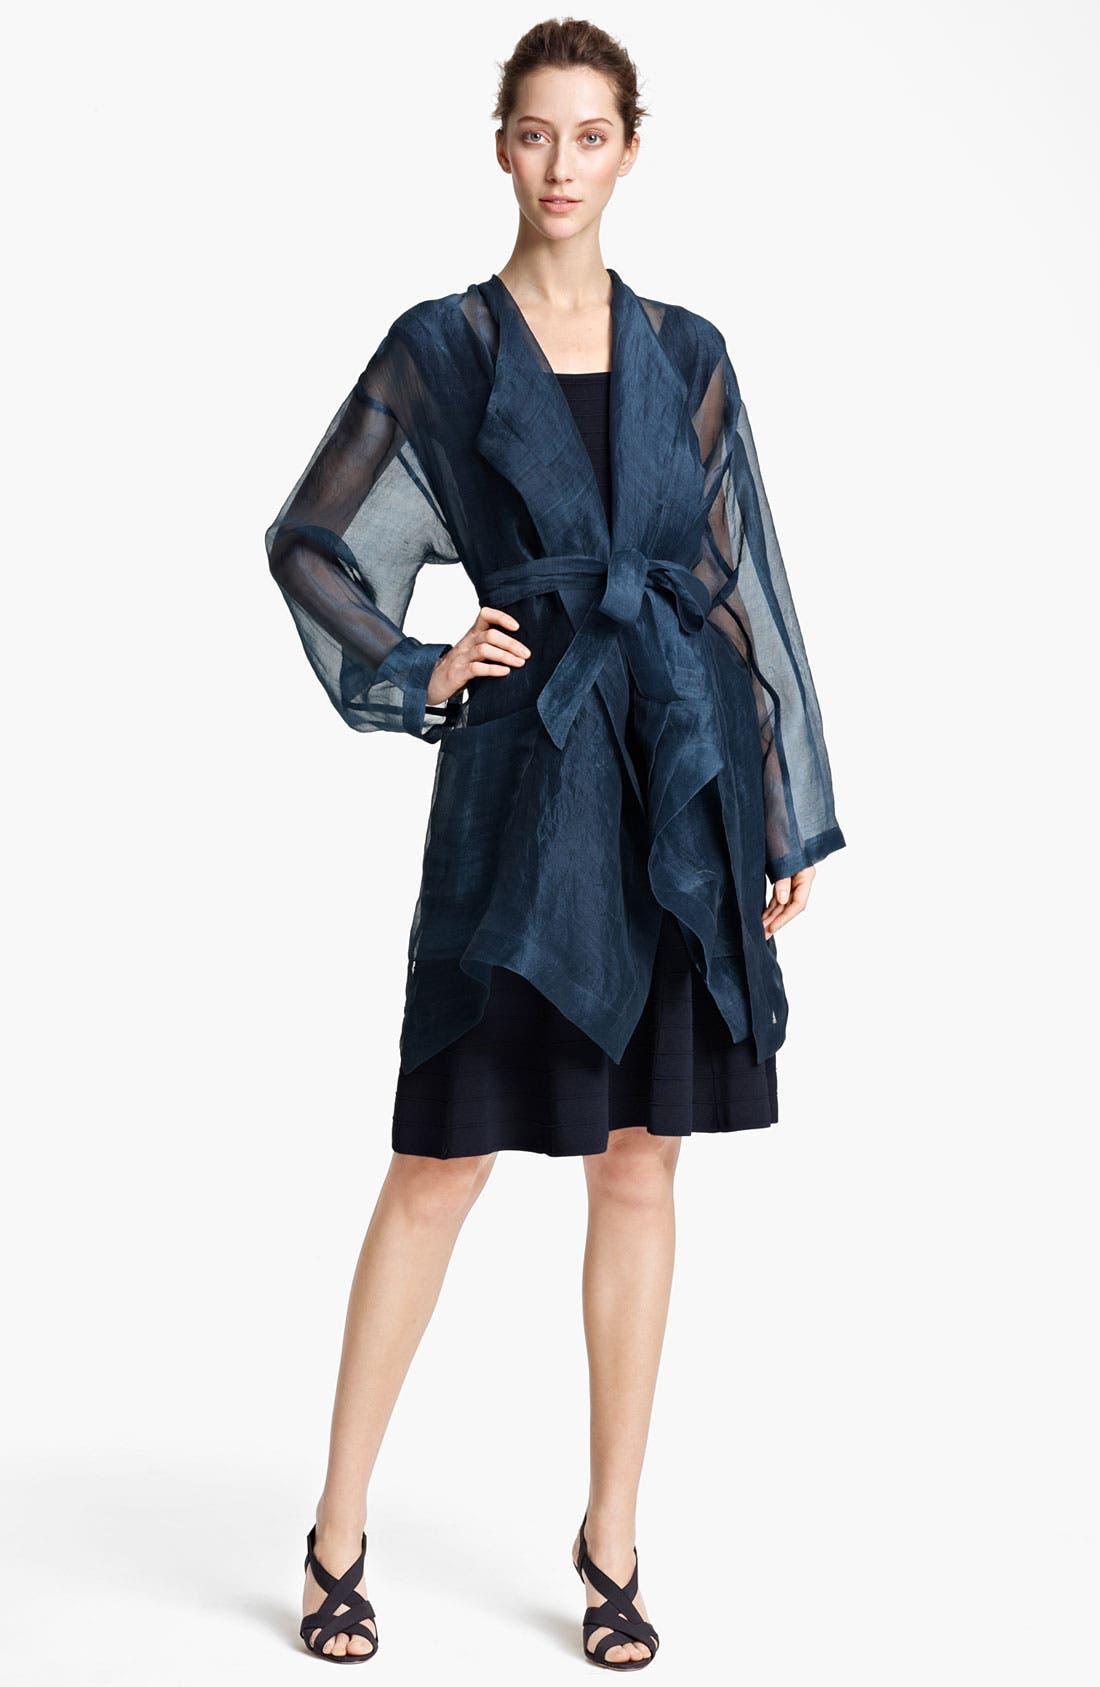 Alternate Image 1 Selected - Donna Karan Collection Coat & Dress